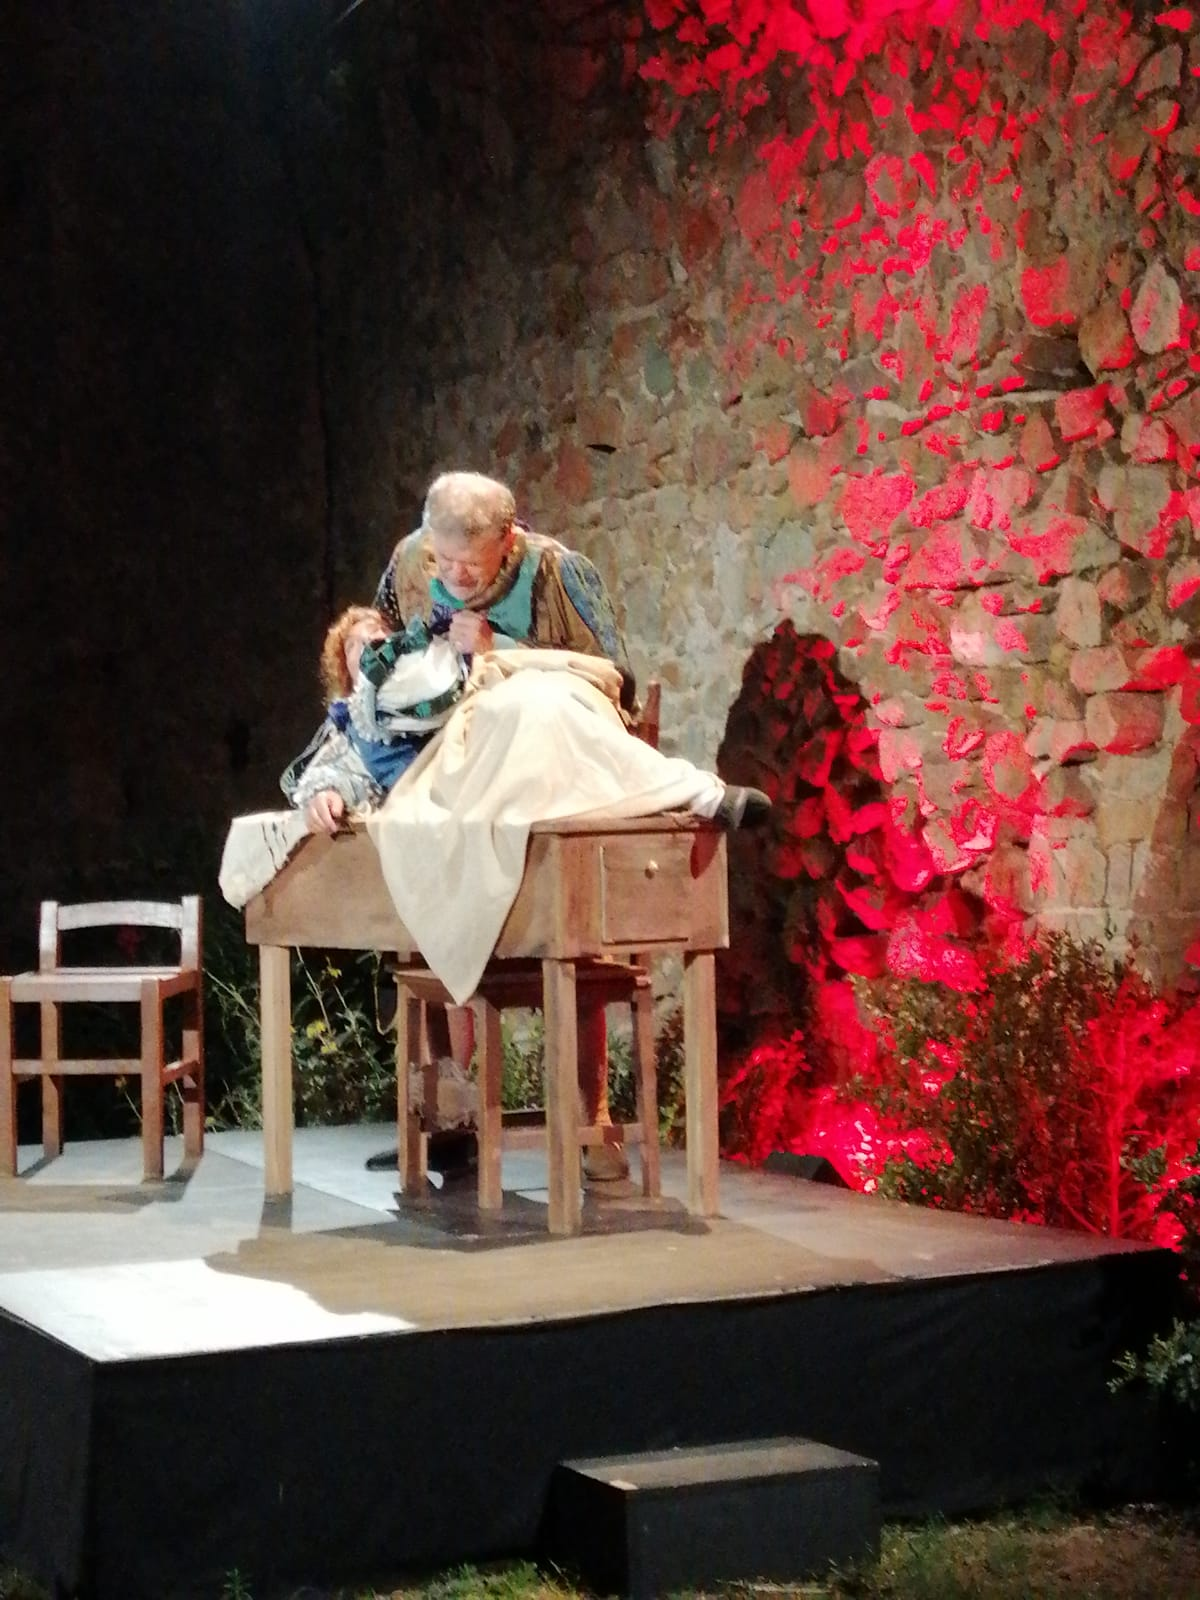 ph. Susanna Toffaloni